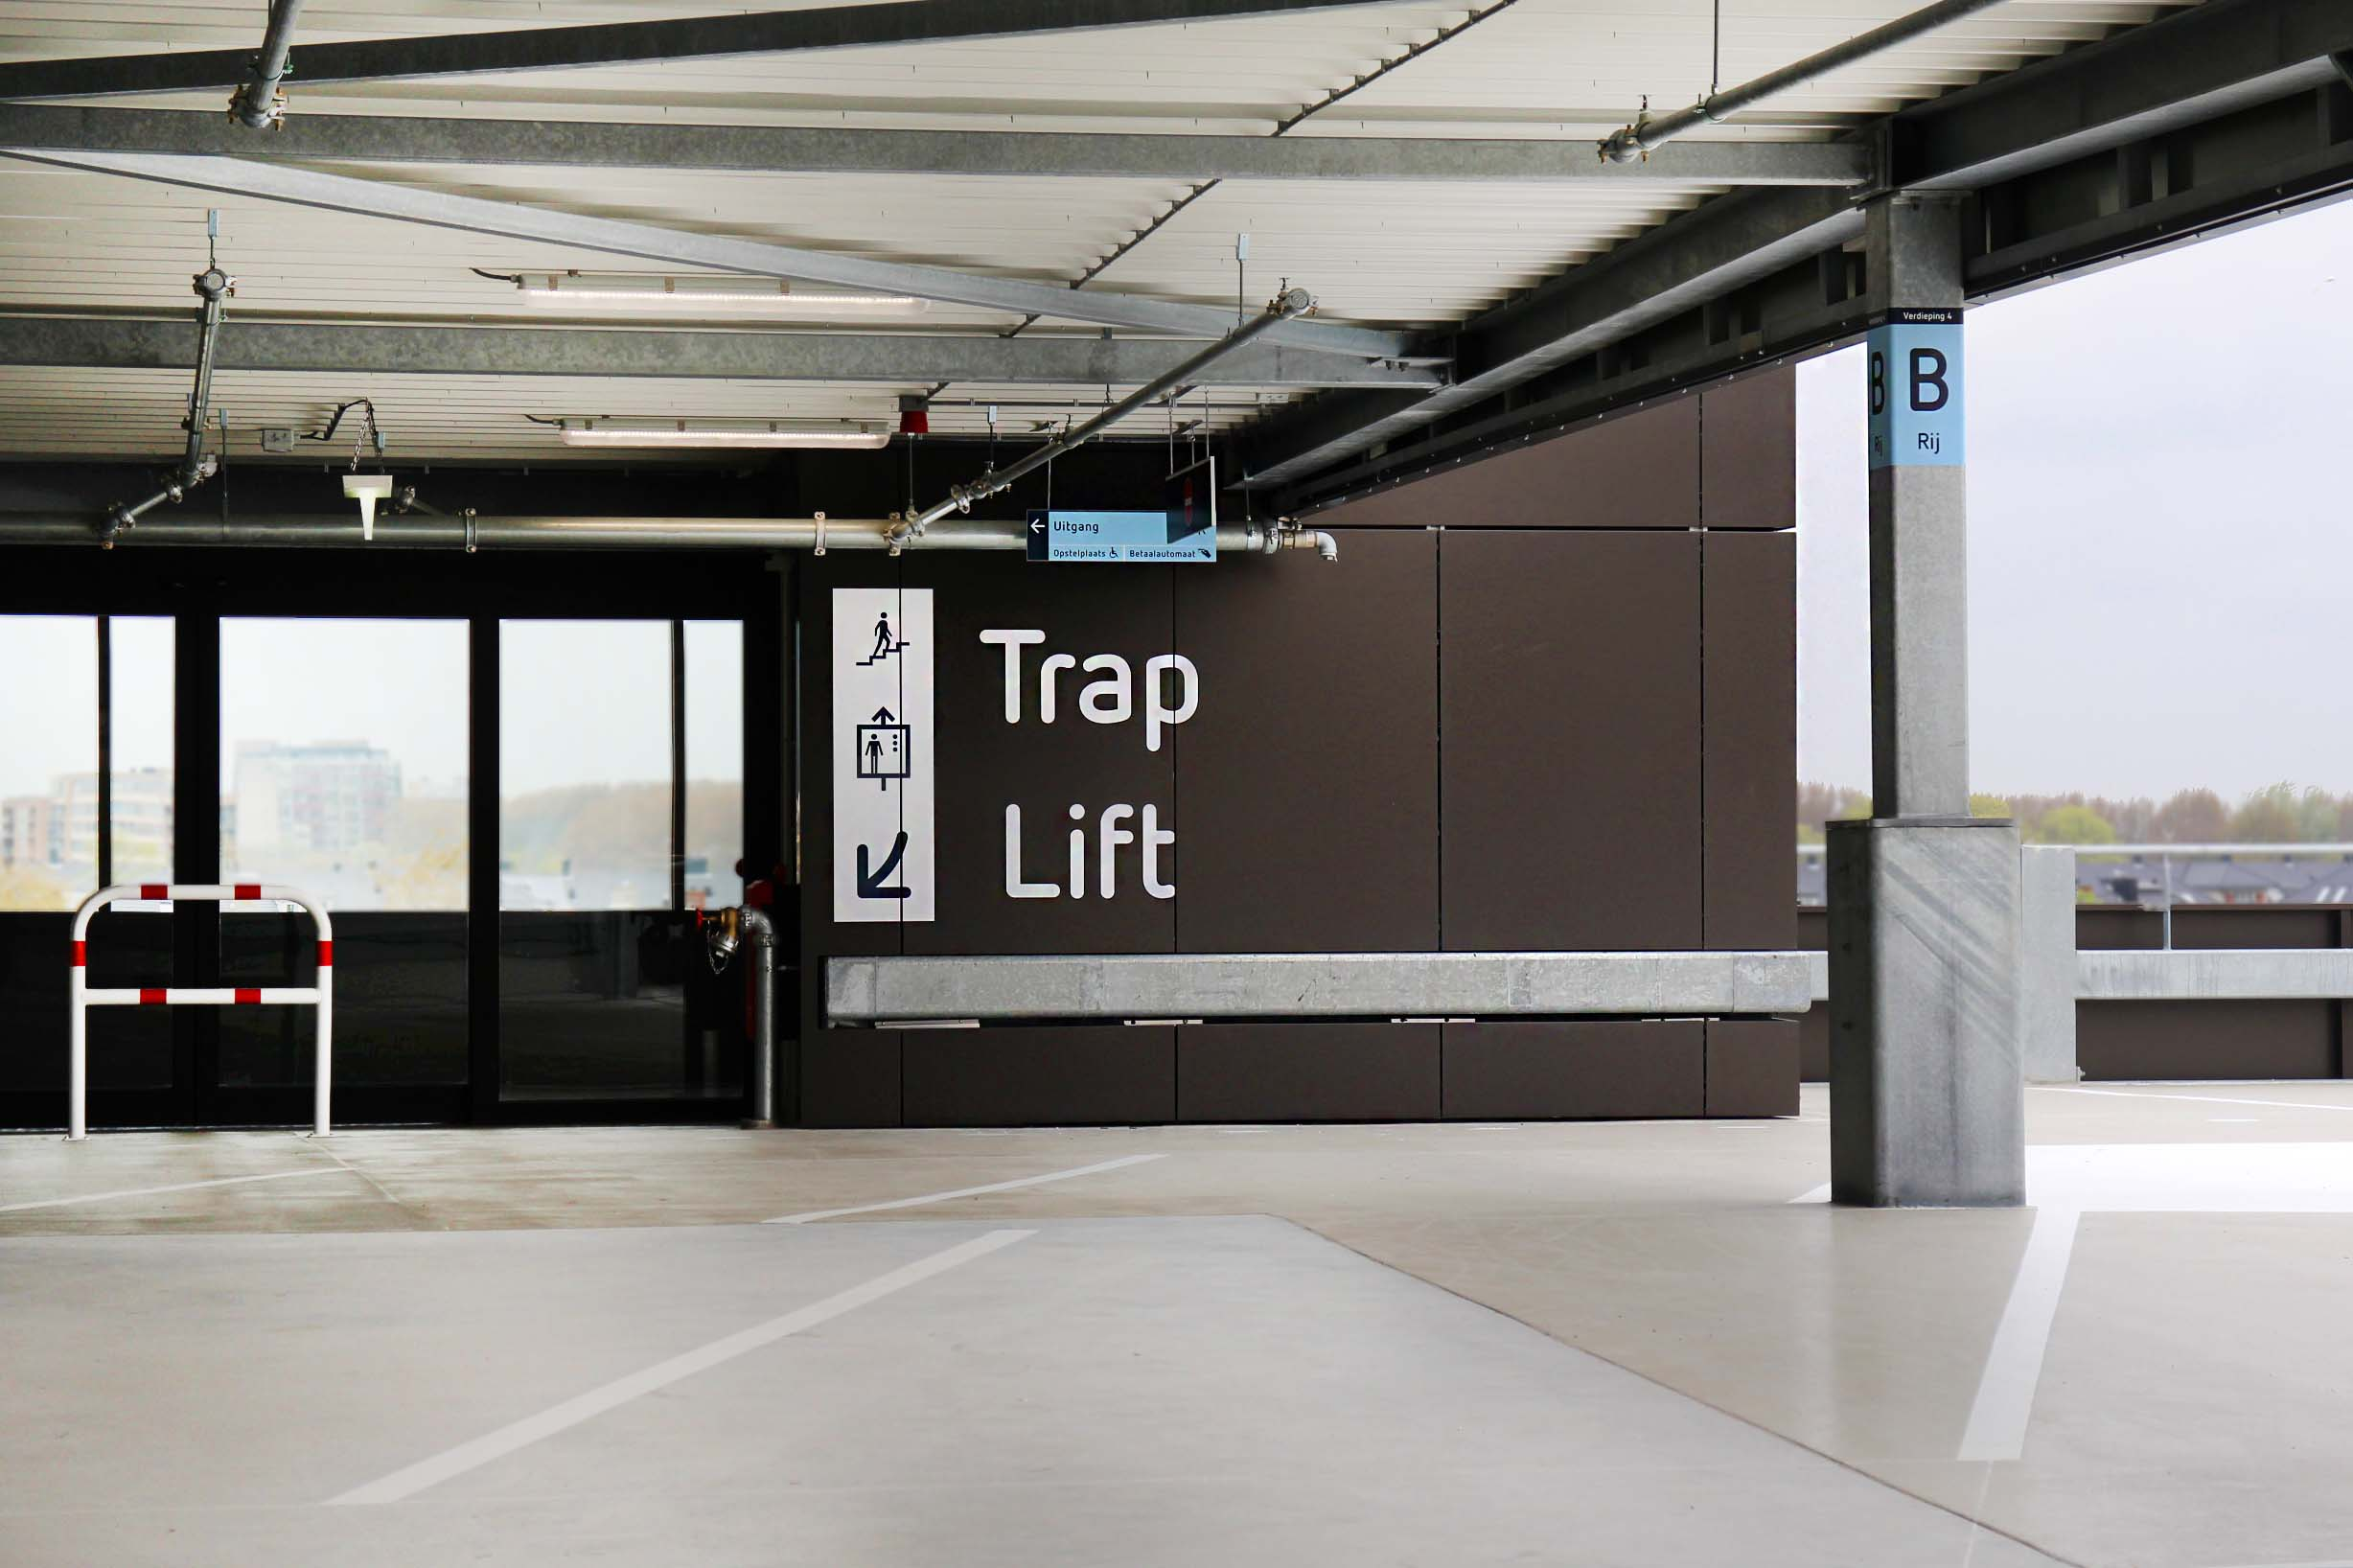 RDG garage — trap 1   Groeneveld Sign Systems